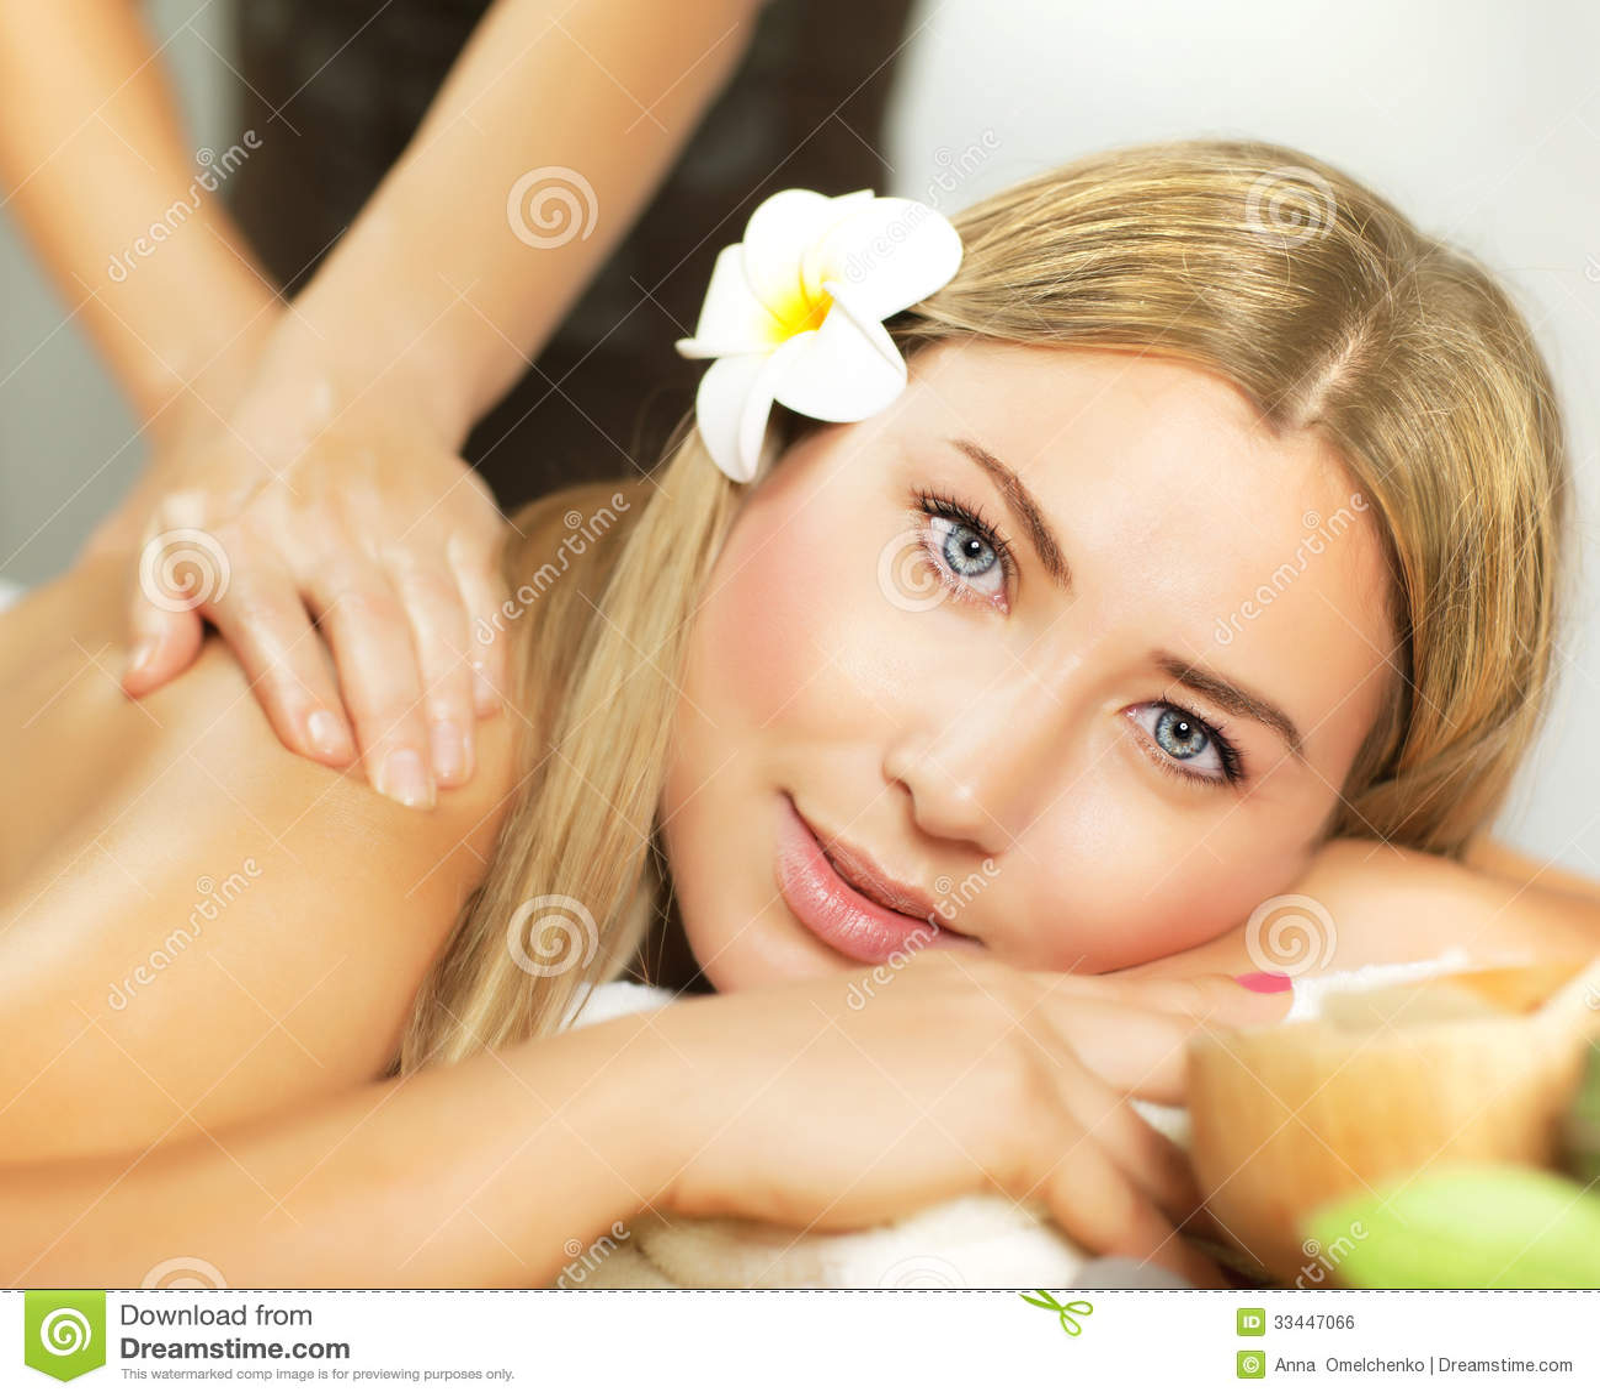 Woman At Spa Stock Photo. Image Of Frangipani, Beautiful